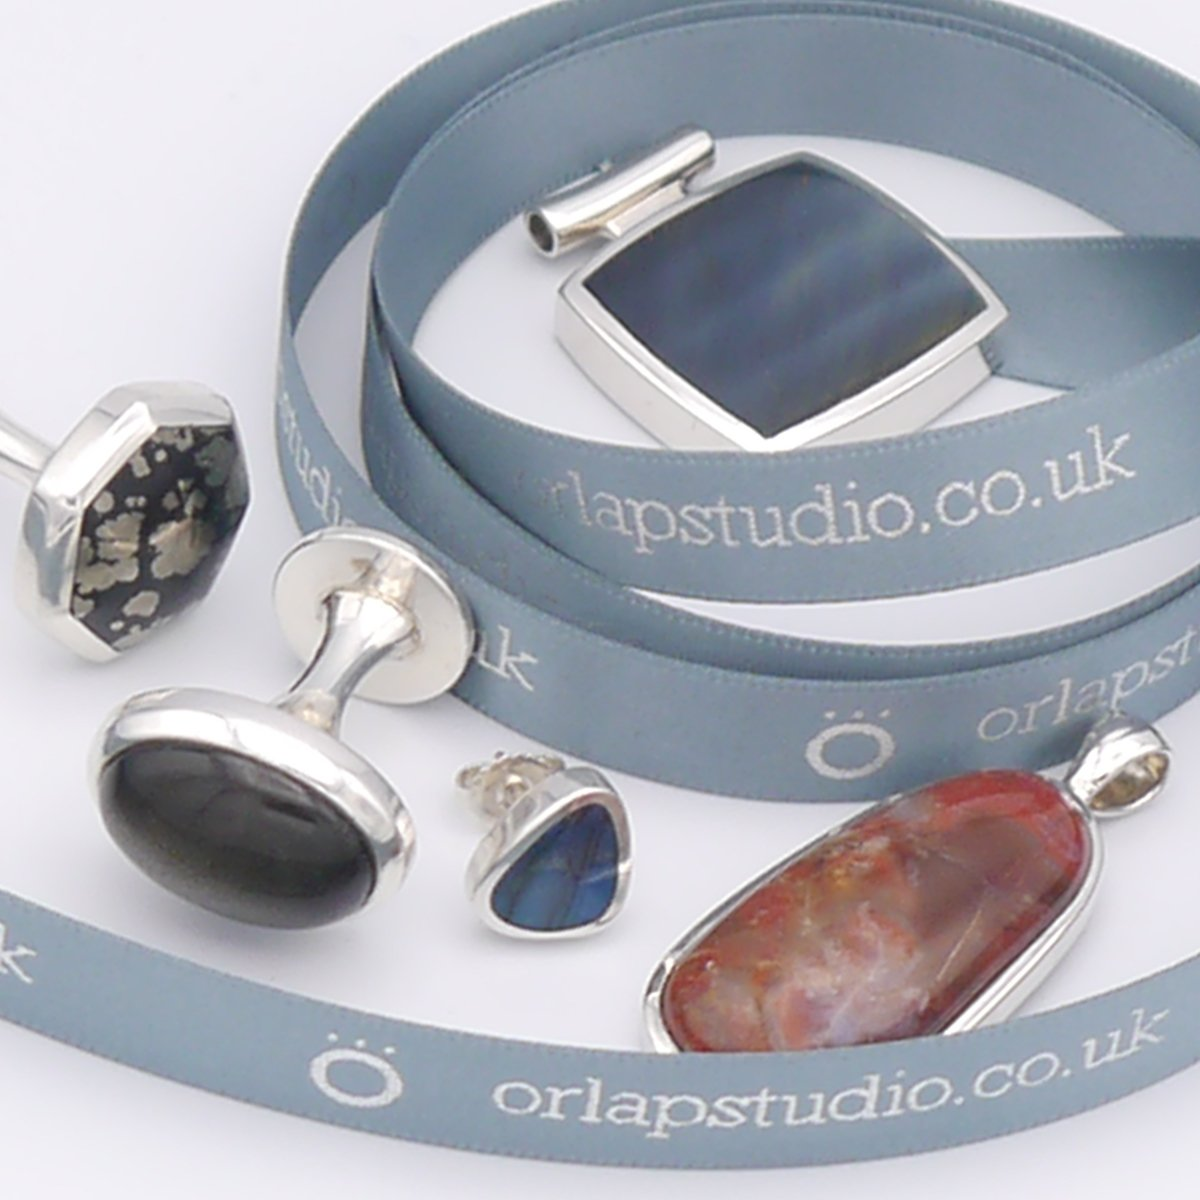 Orlap Studio Etsy Silver Jewellery Cufflink Image